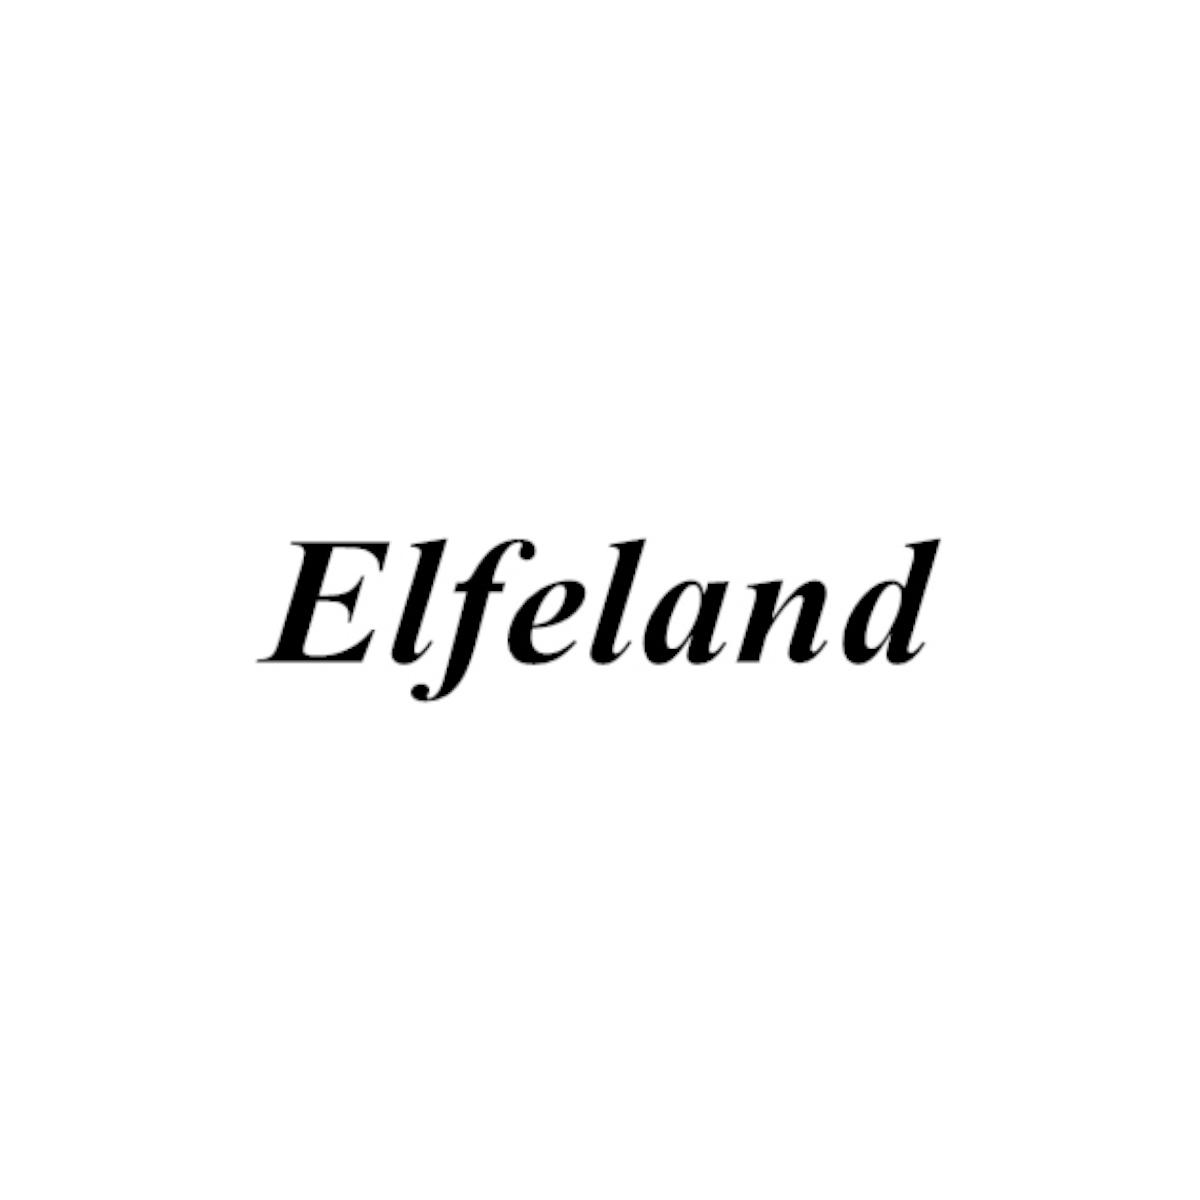 elfeland